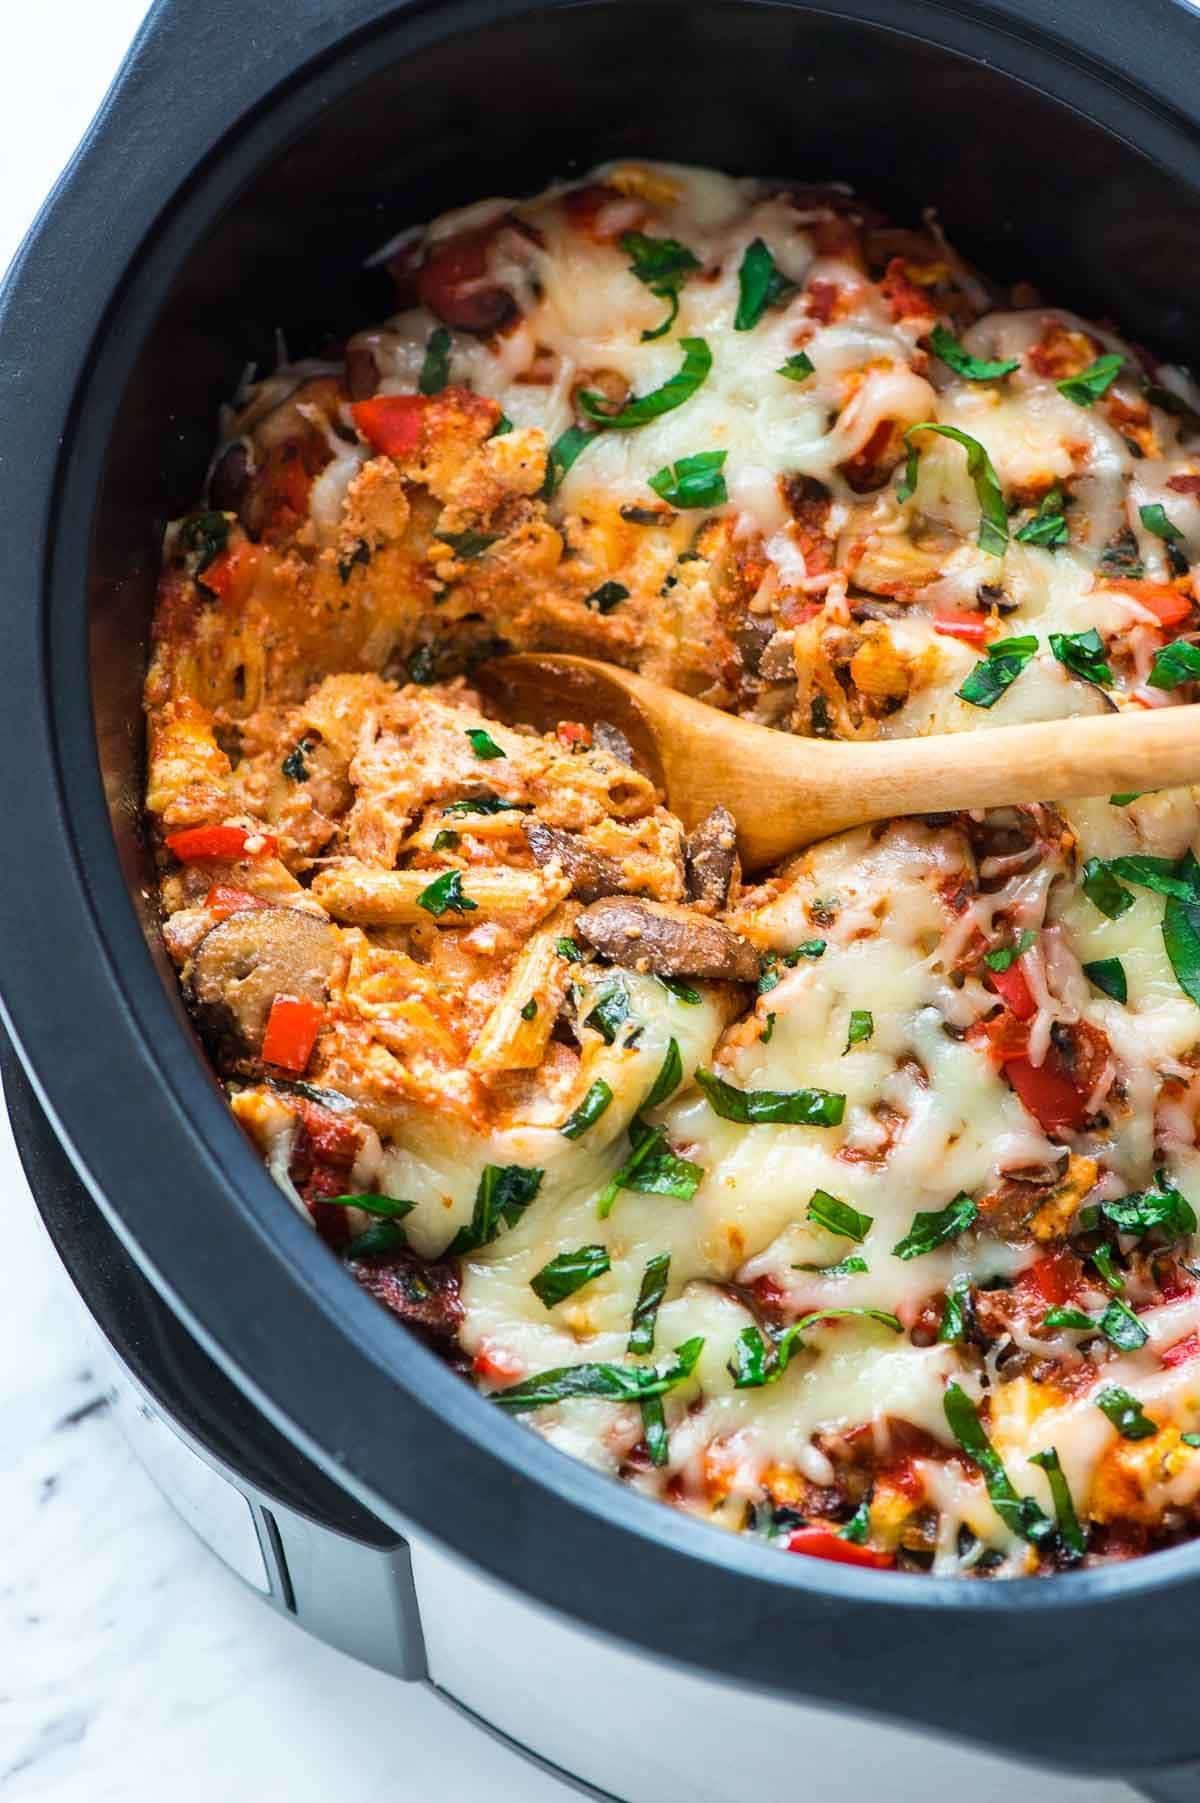 Crockpot Vegetarian Recipes  Crock Pot Pasta Recipe Meatless Pasta Dinner